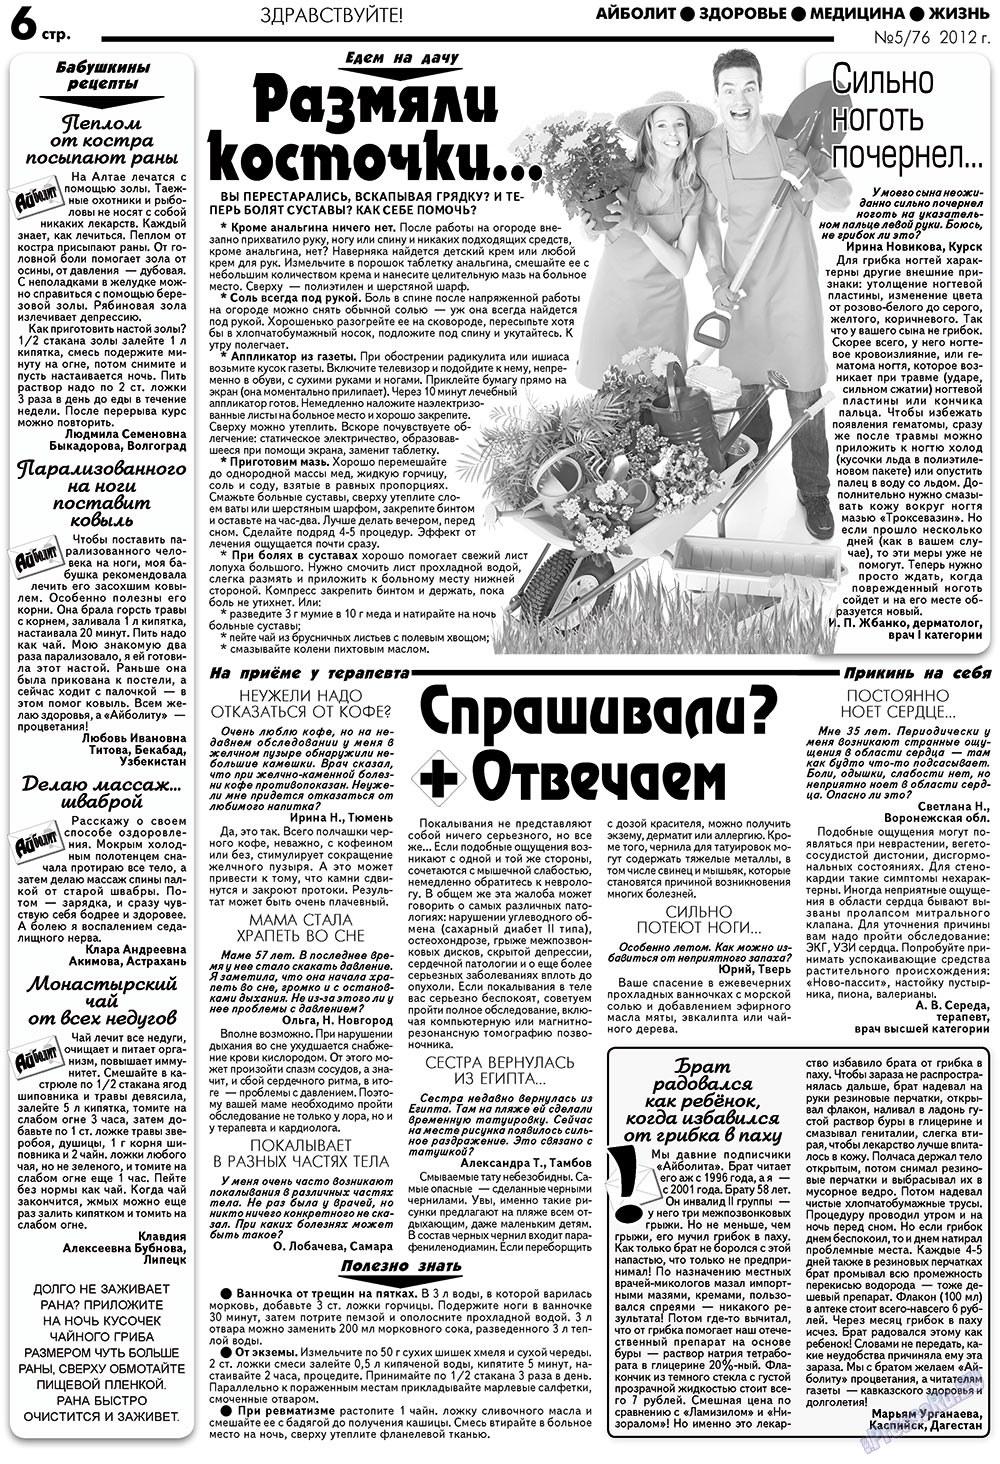 АйБолит (газета). 2012 год, номер 5, стр. 6